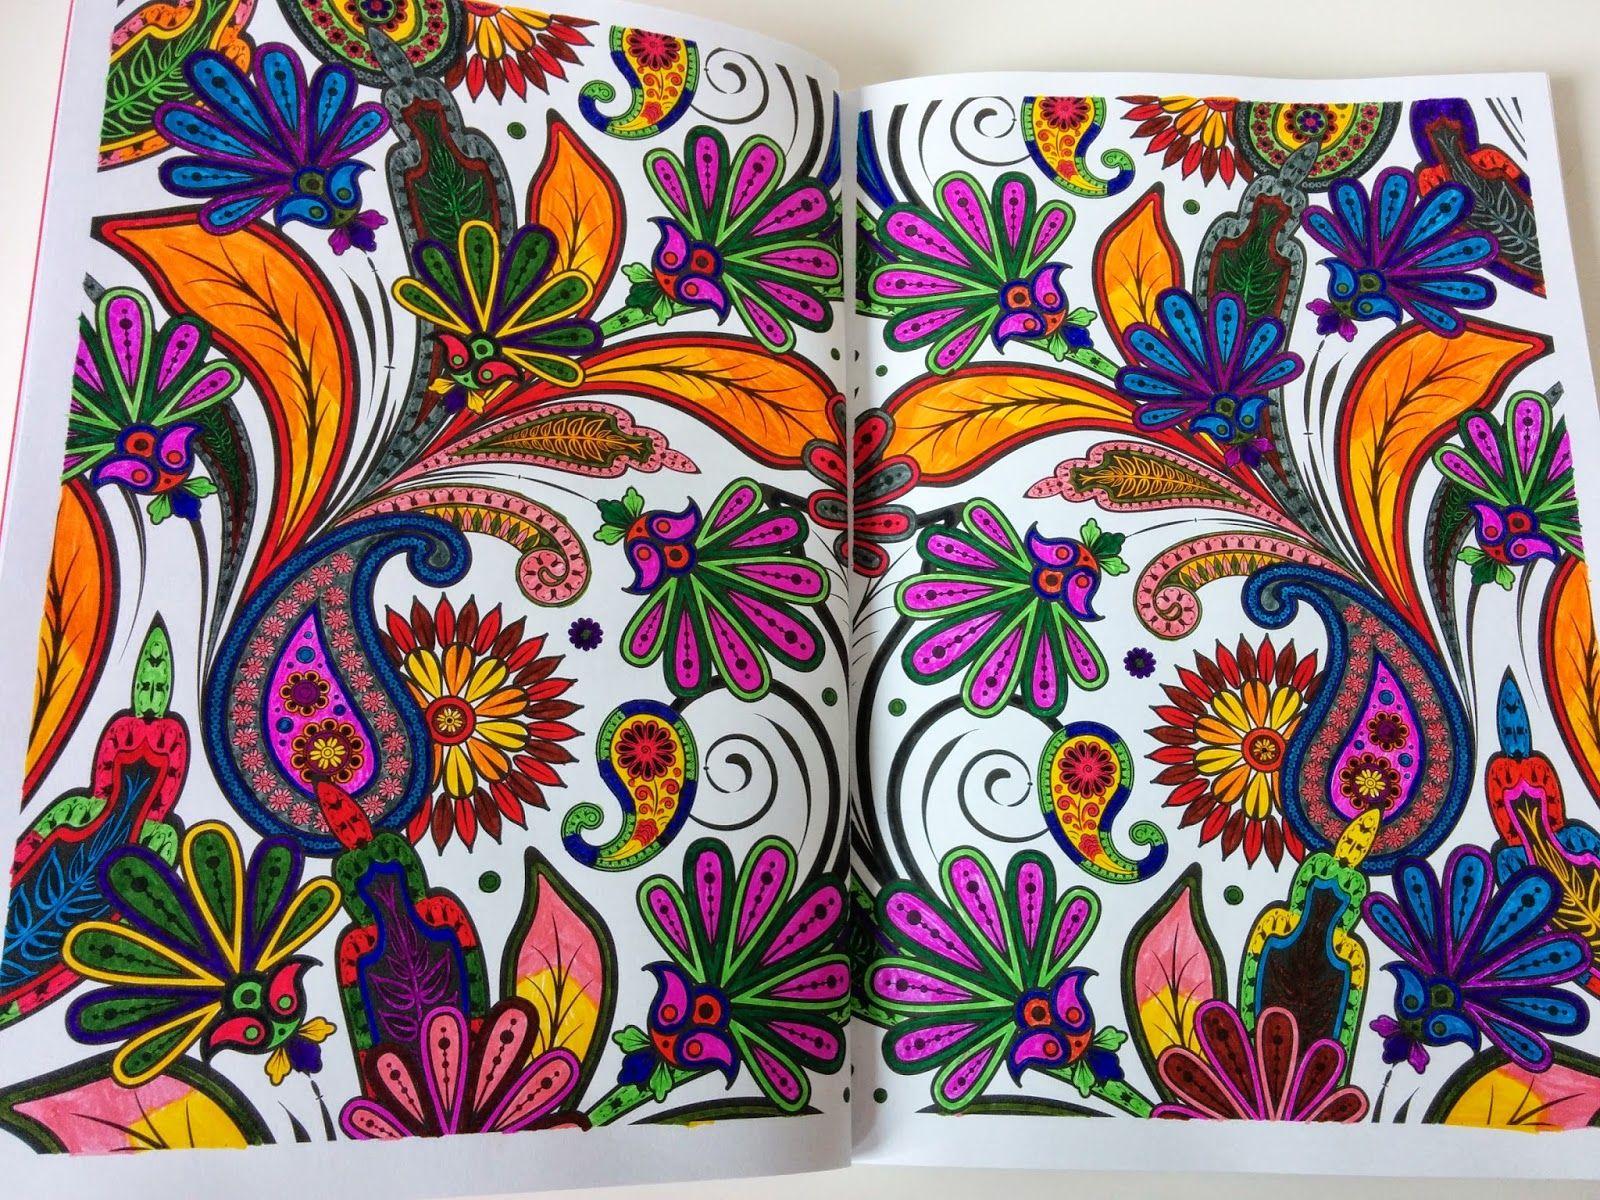 Livros De Colorir Para Adultos: Livro Colorir Adulto Psiquiatra